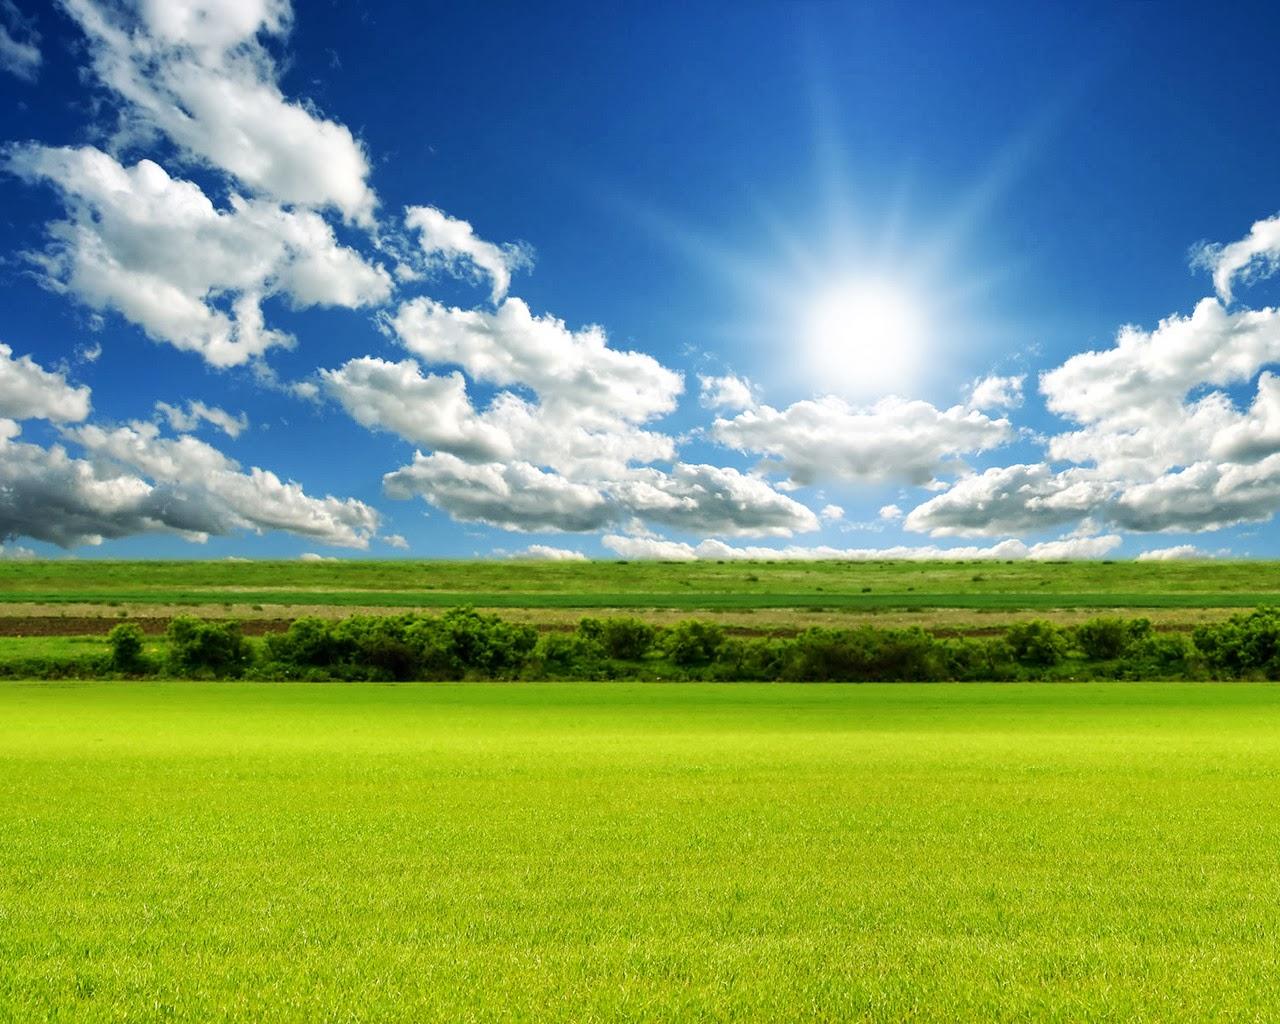 Hd wallpaper nature download - Full Hd Nature Wallpapers Free Download For Laptop Full Hd Nature